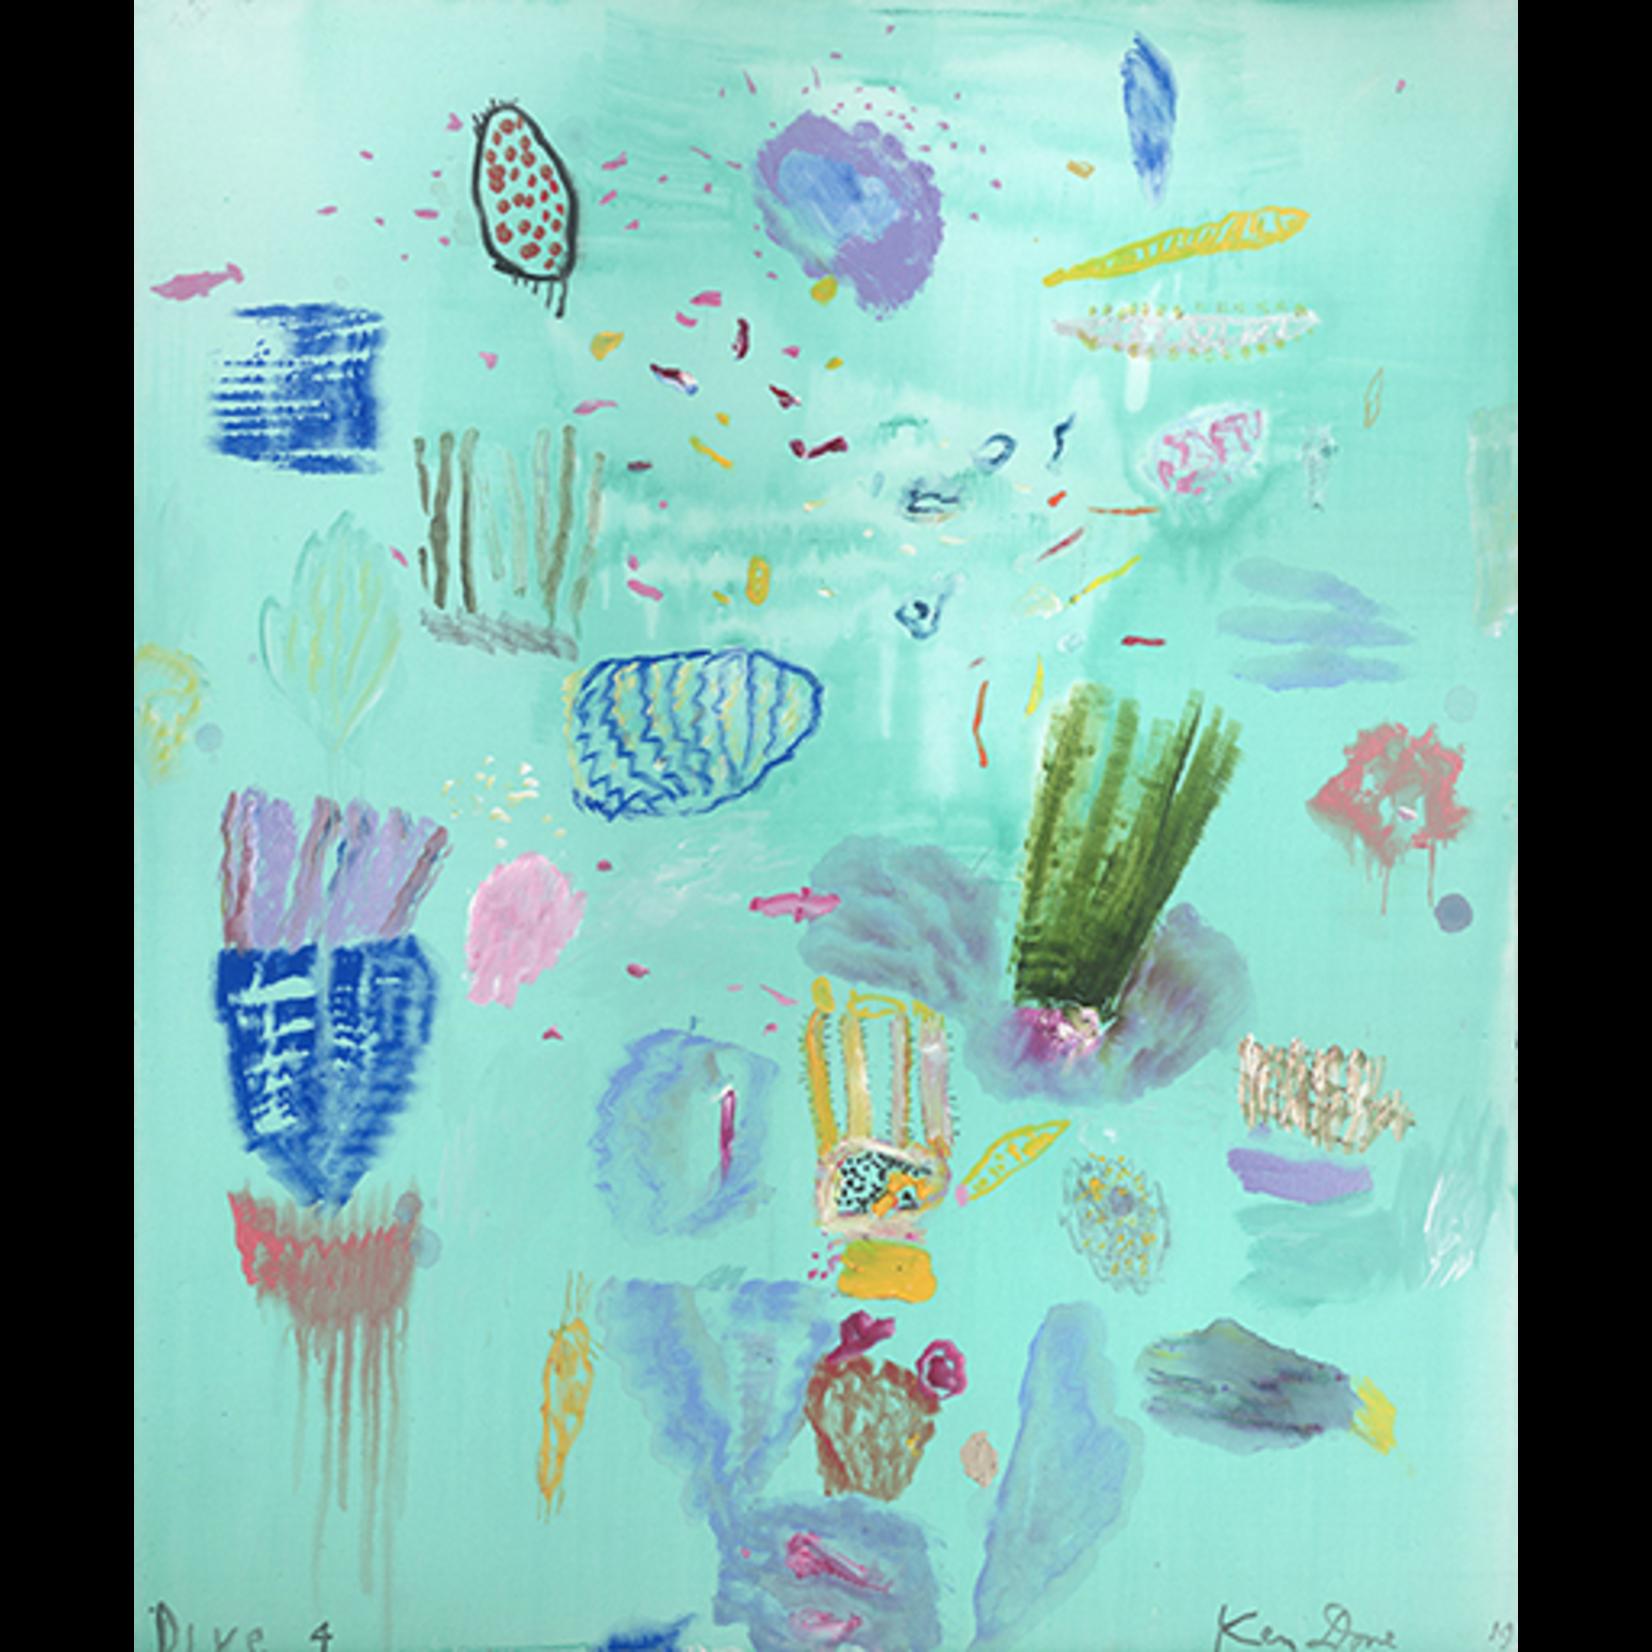 Limited Edition Prints Dive 4, 2019